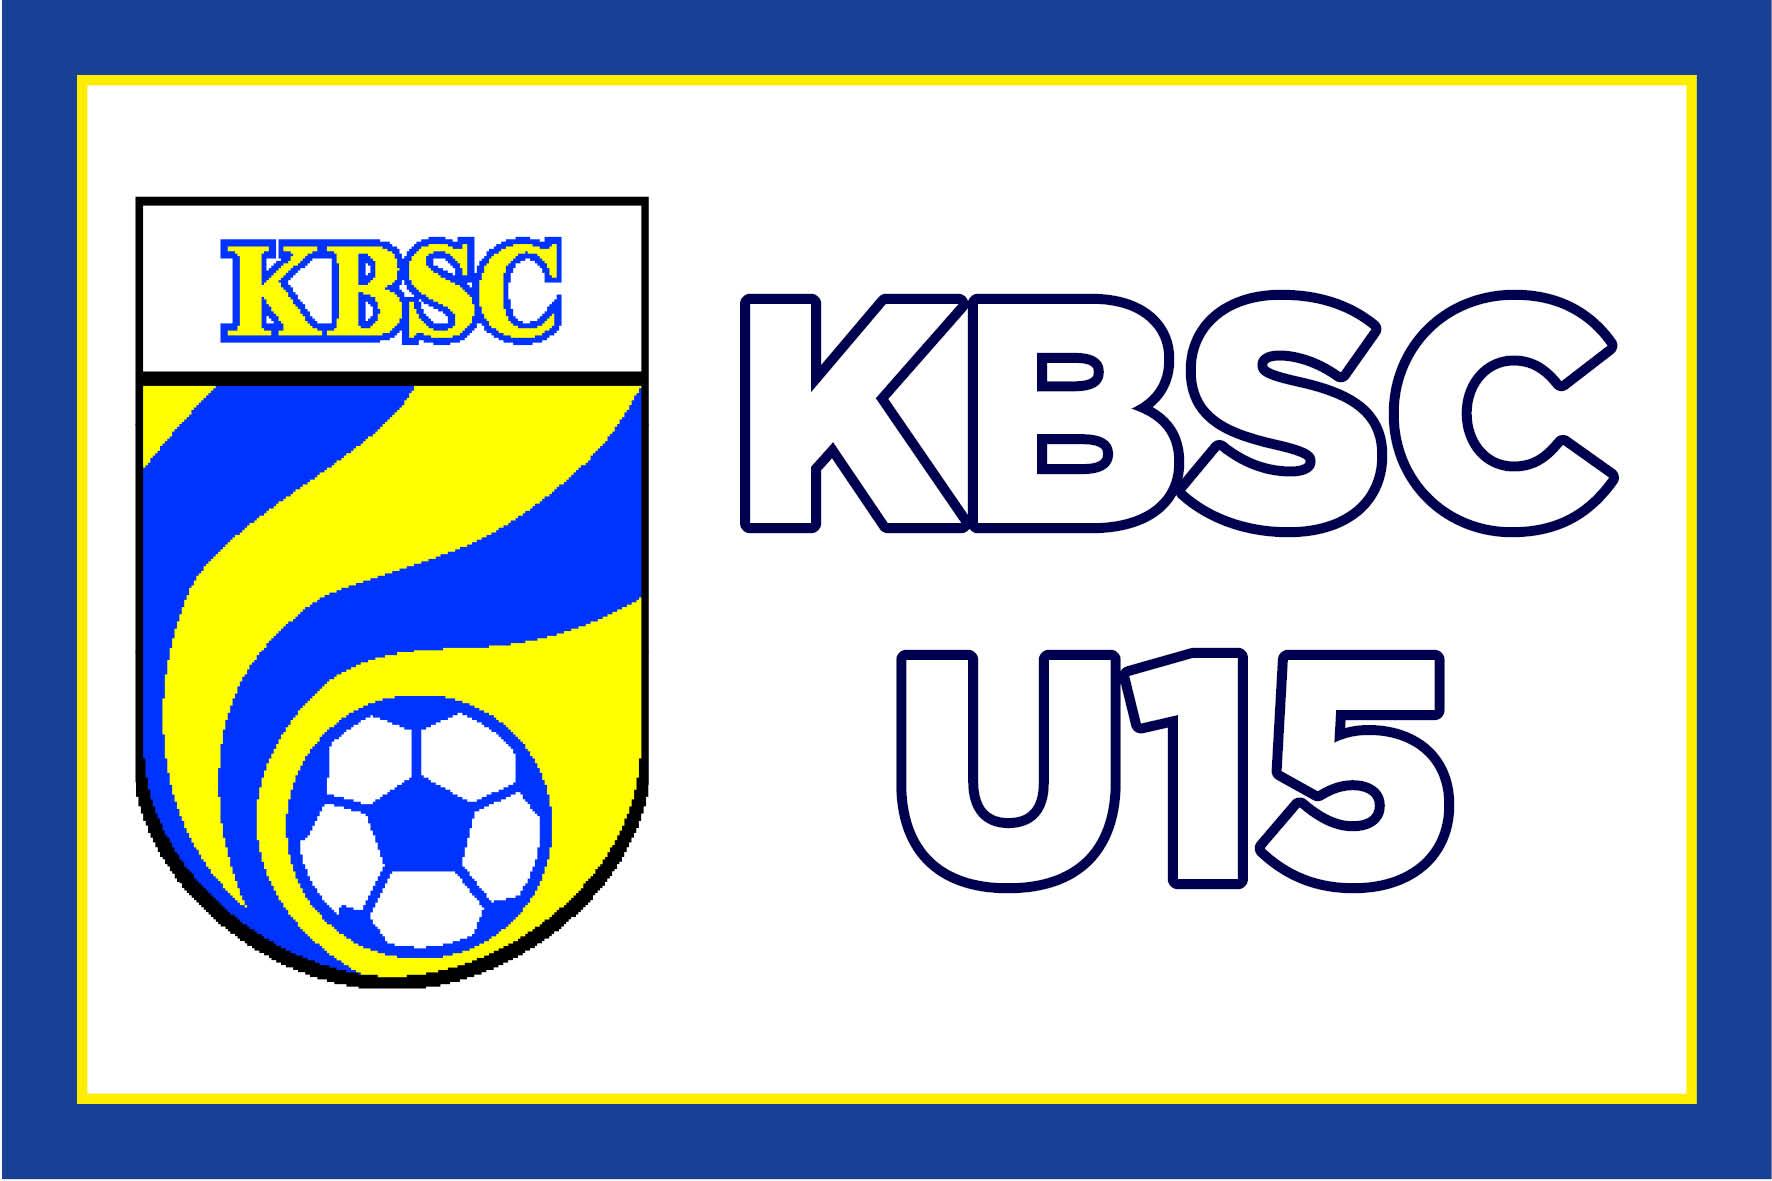 https://kolorline.hu/Véget ért a KBSC U15 veretlensége